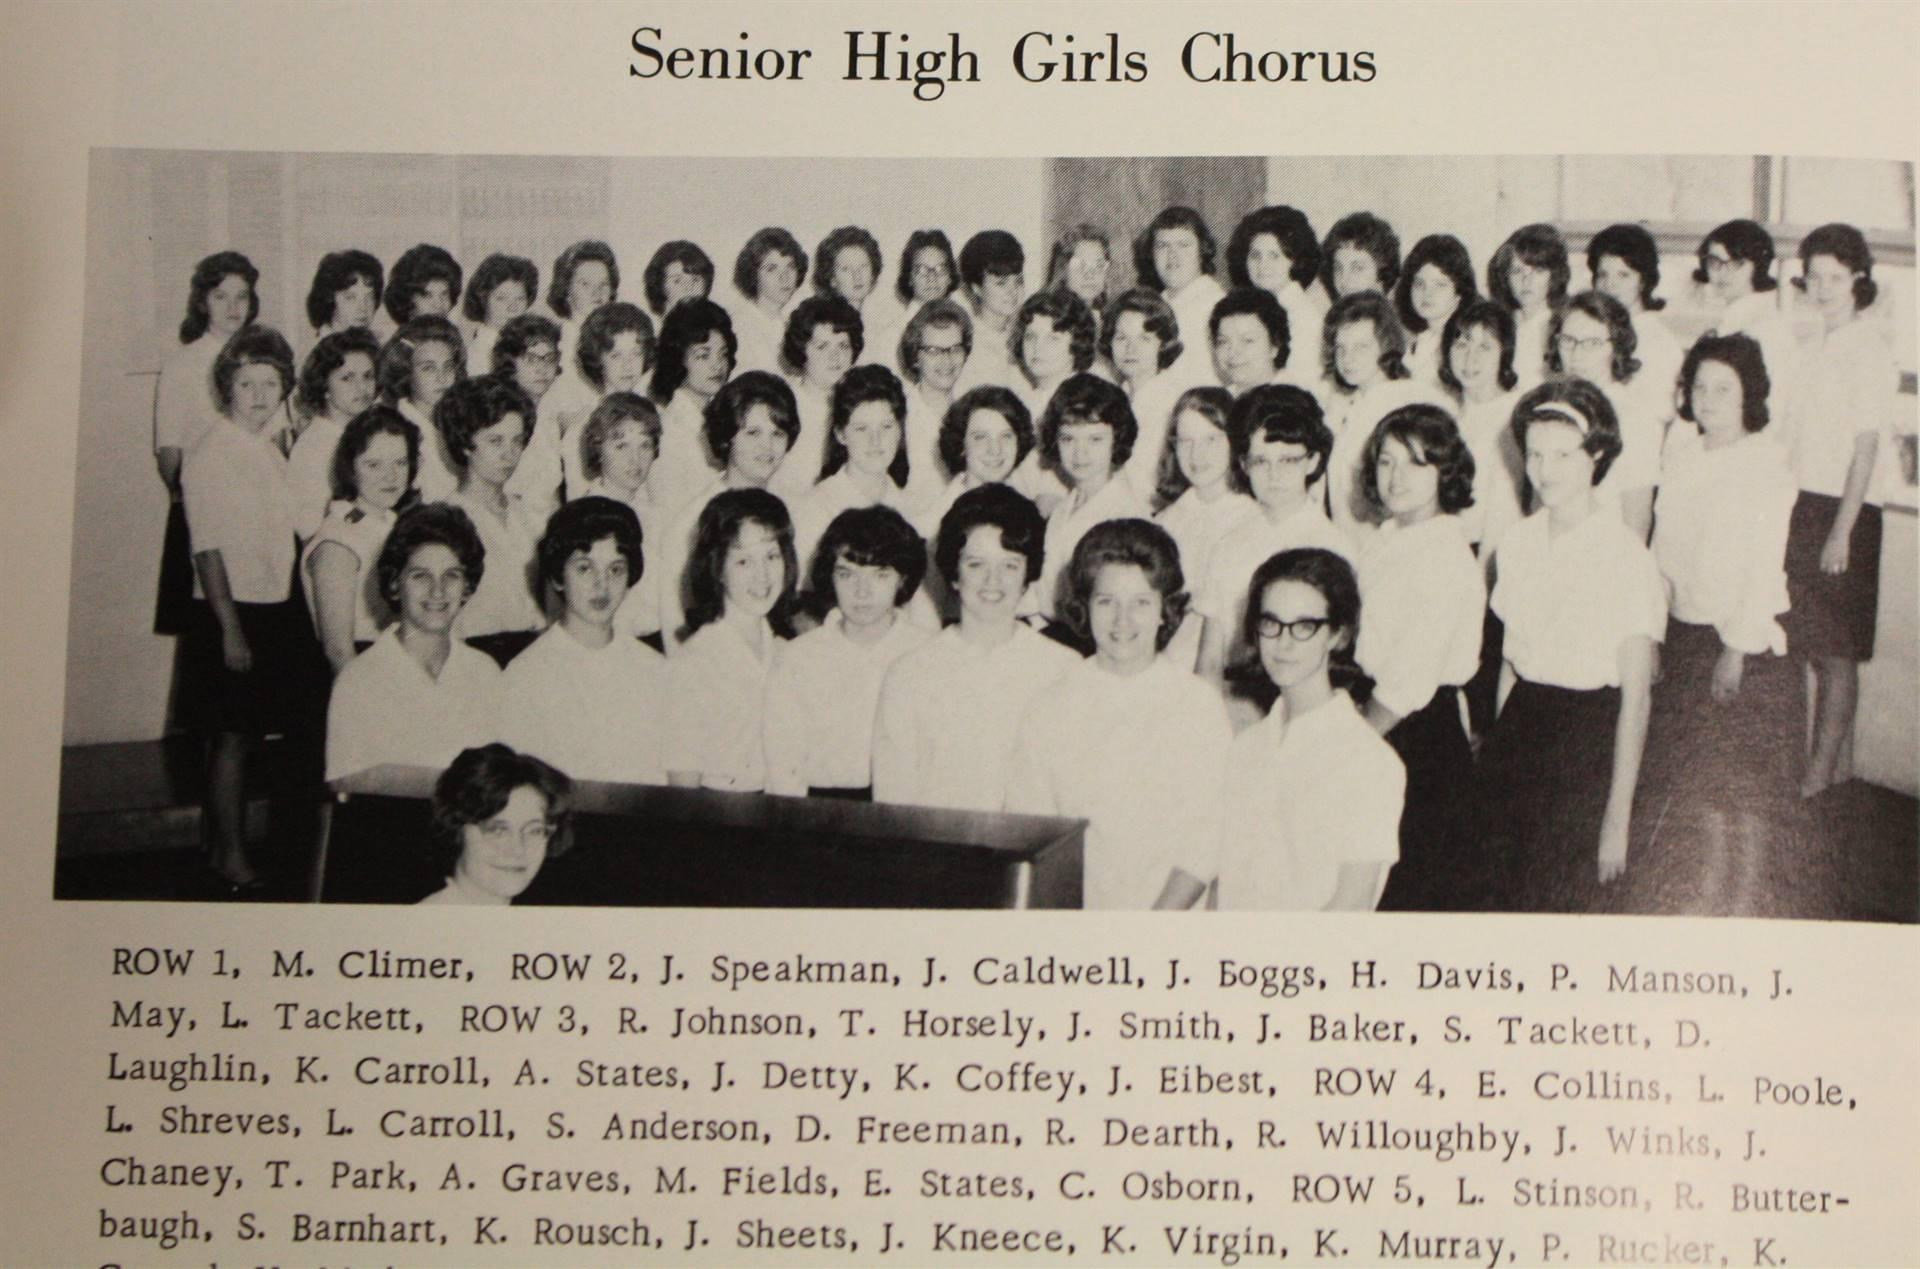 1965 senior high girls chorus